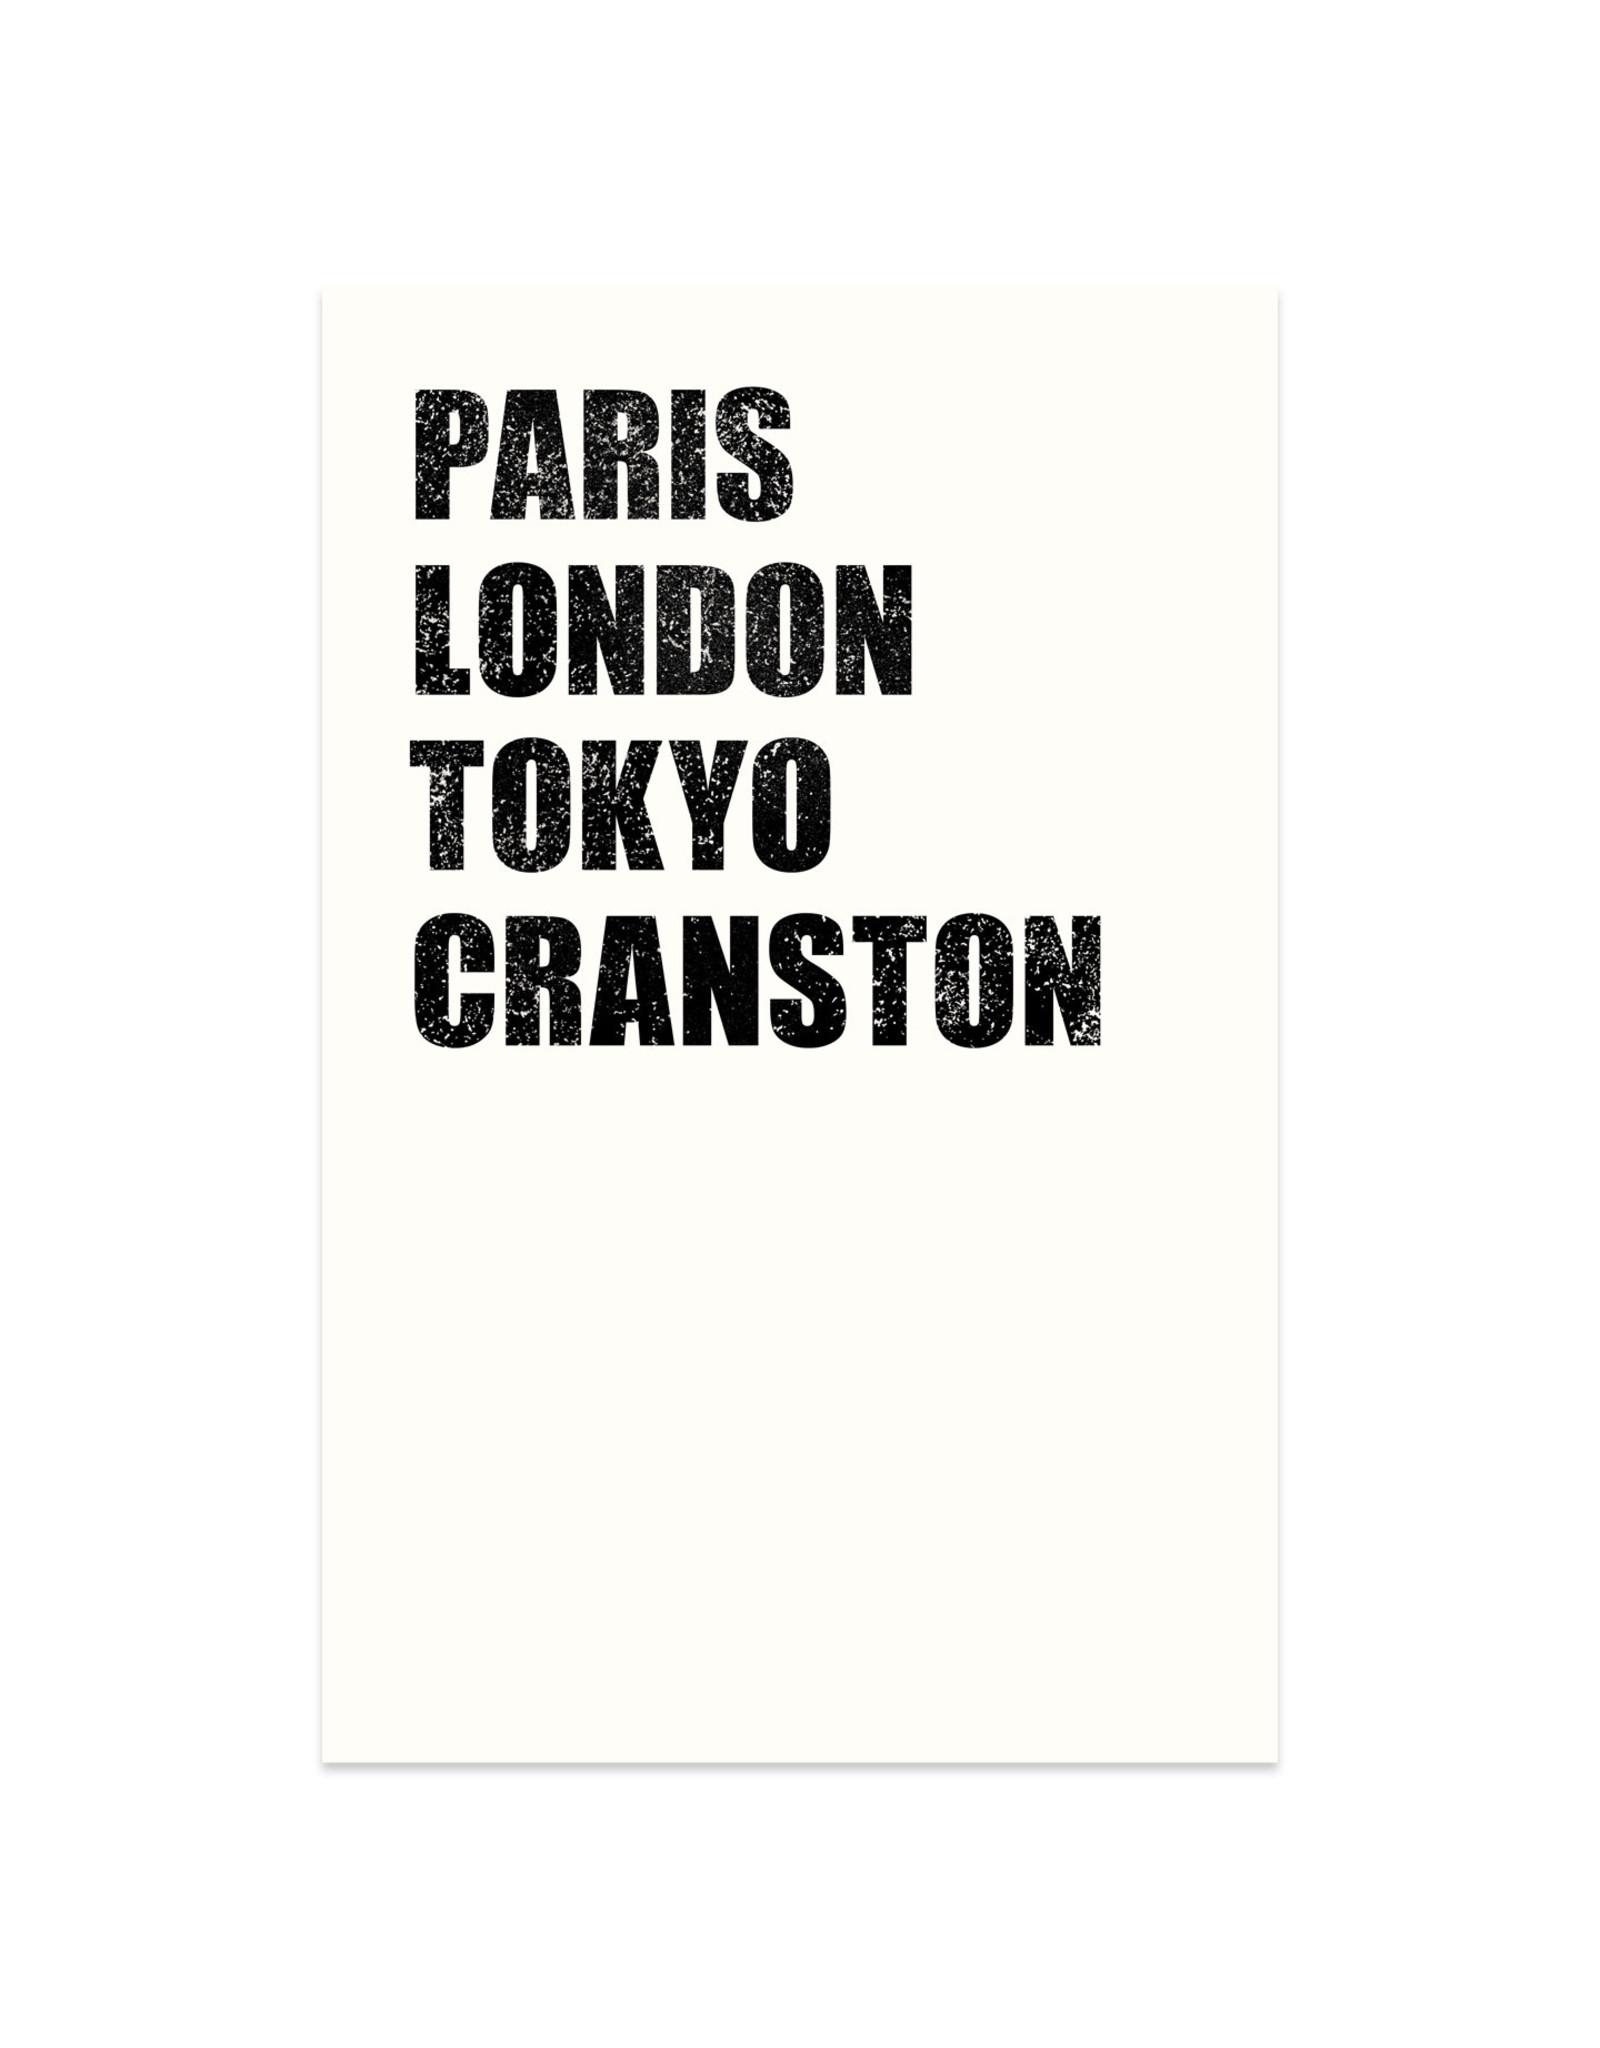 Paris London Tokyo Cranston Print